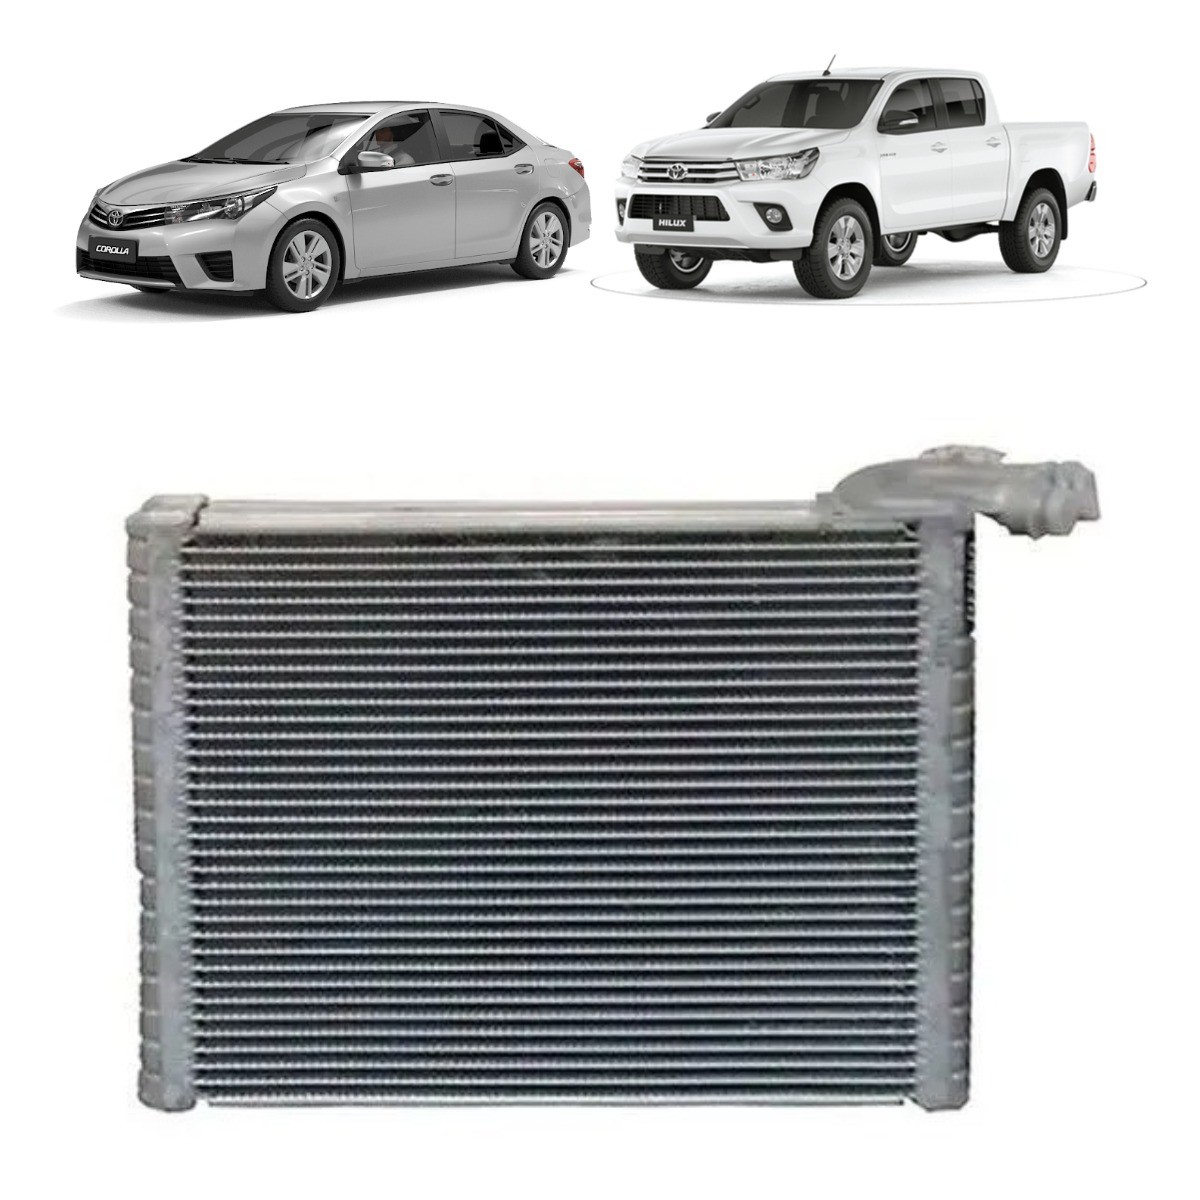 Evaporador Toyota Corolla,  Hilux, Rav, SW4 - Denso